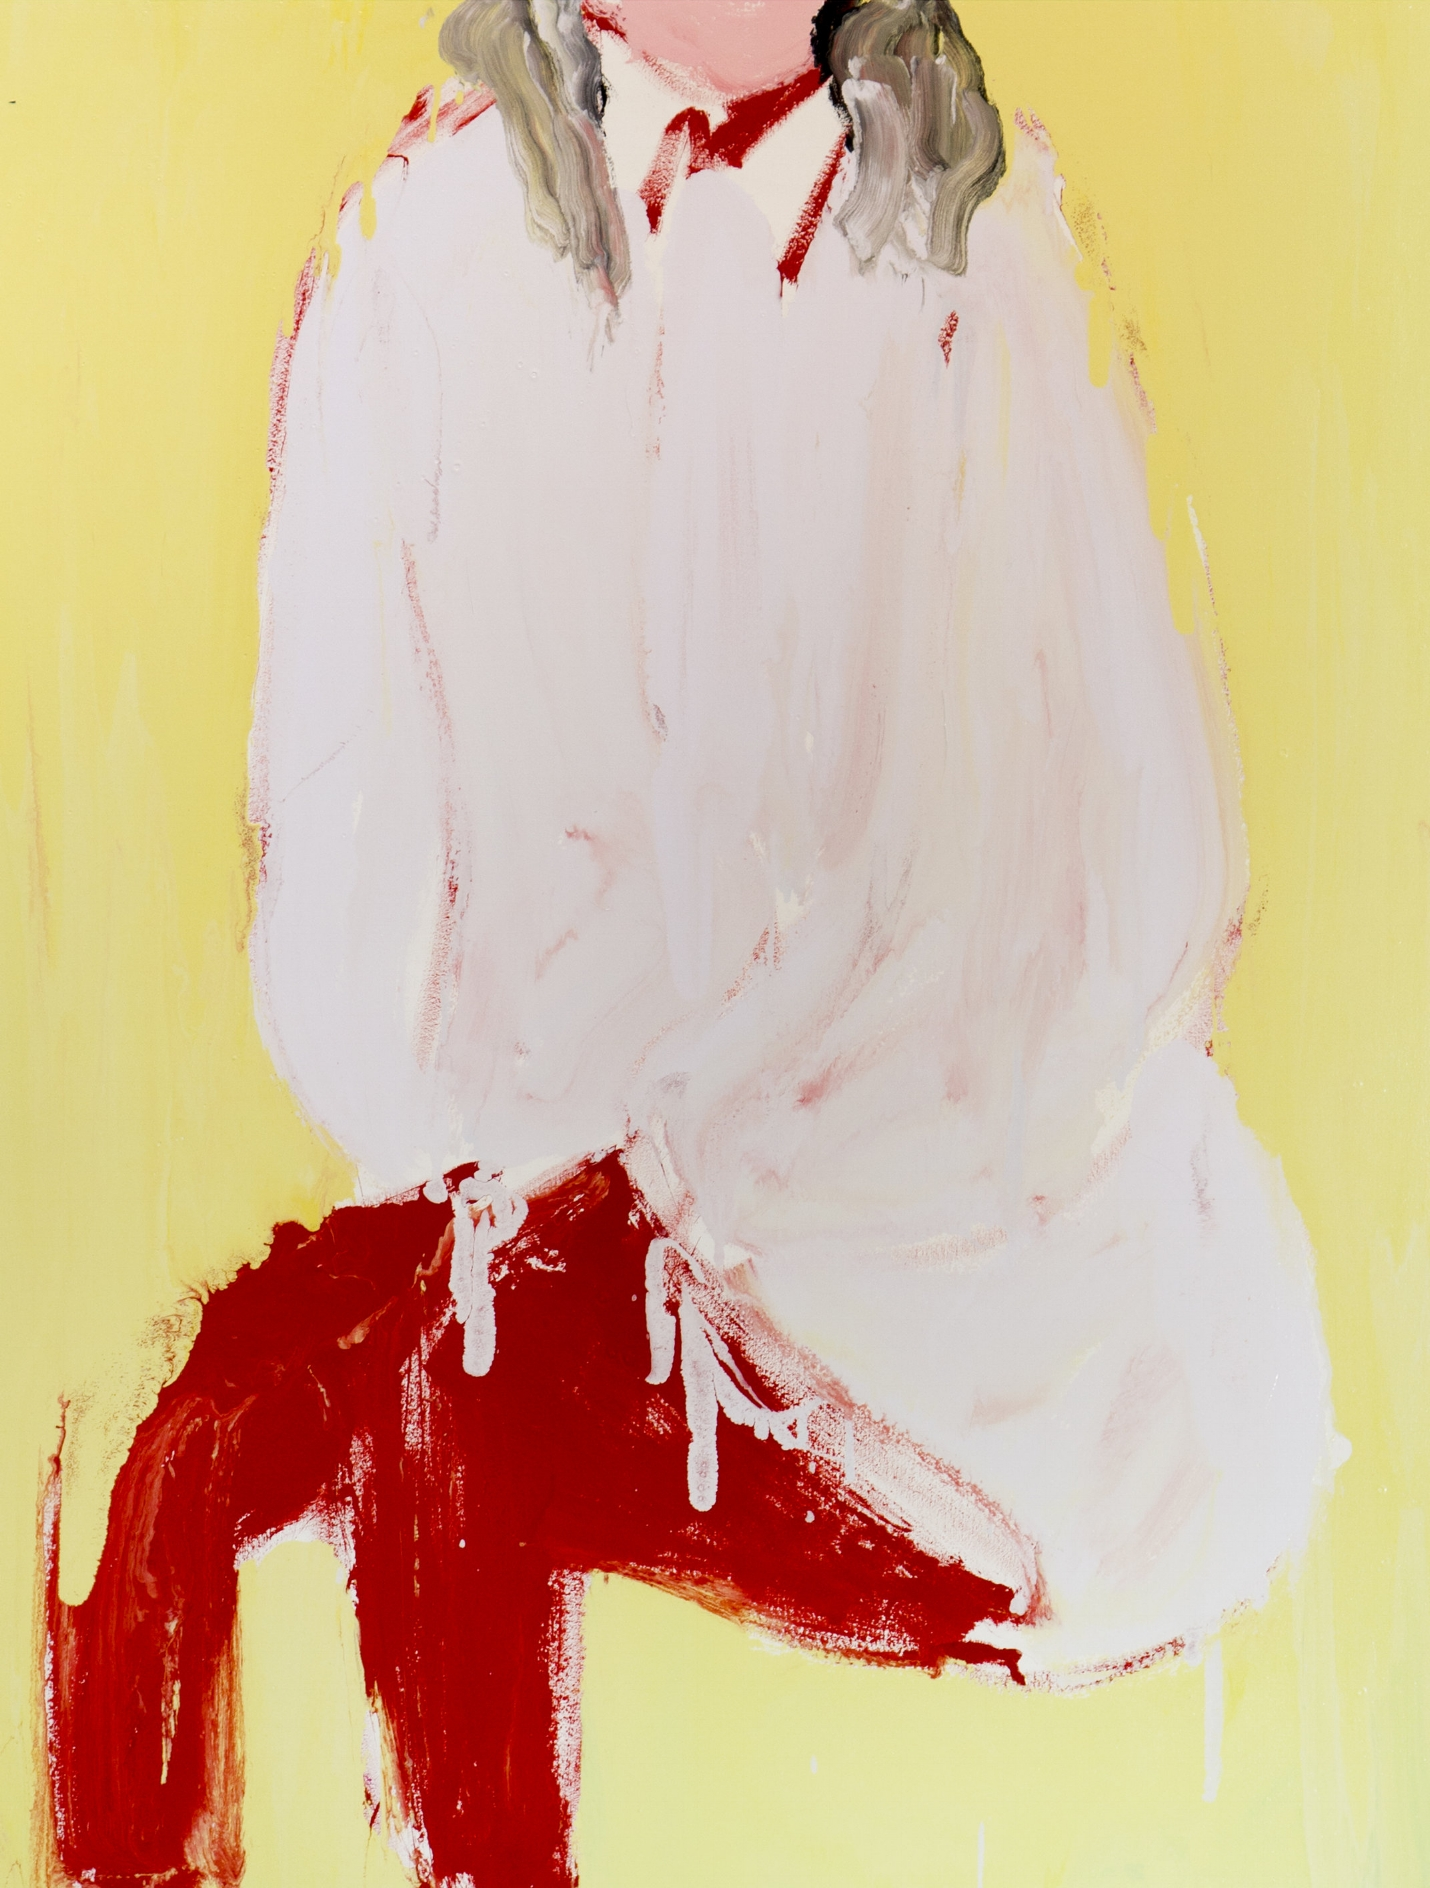 The Headless Unicorn, 2017, enamel paint on canvas, 137 x 107 cm